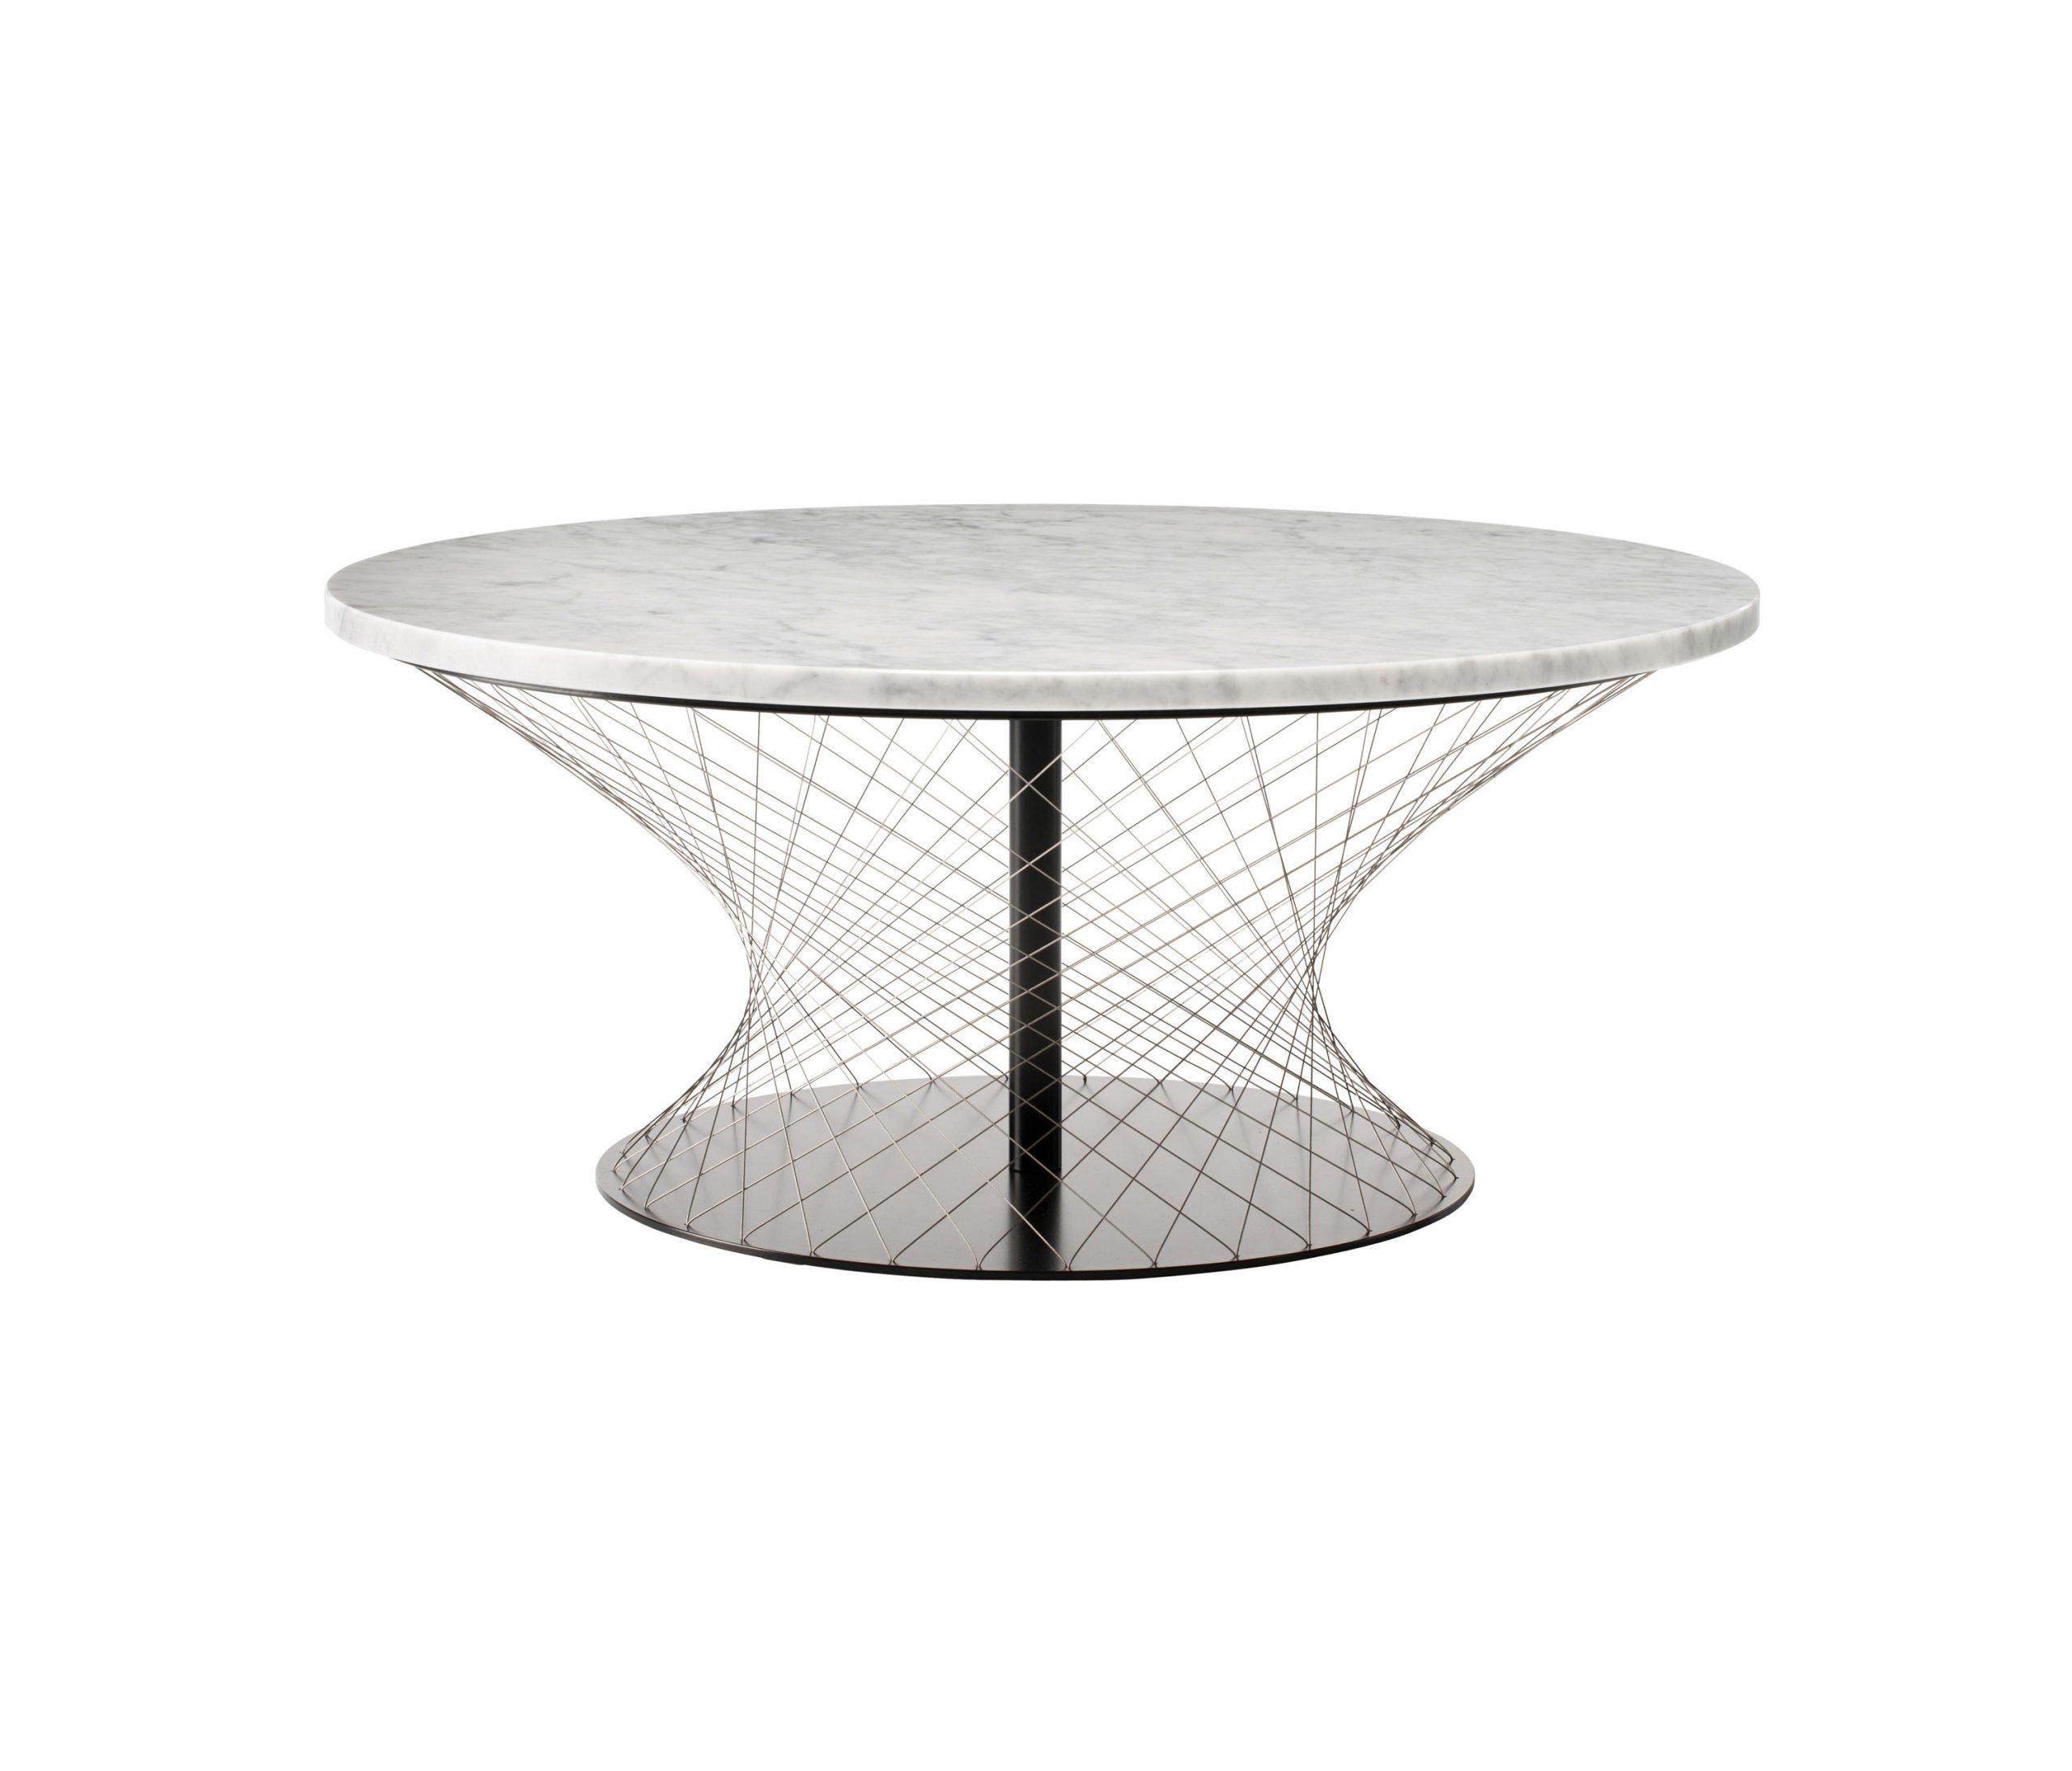 Network   Coffee Table - Tables Basses De Favius   Architonic avec Carrelage Id 76753 Cappucino